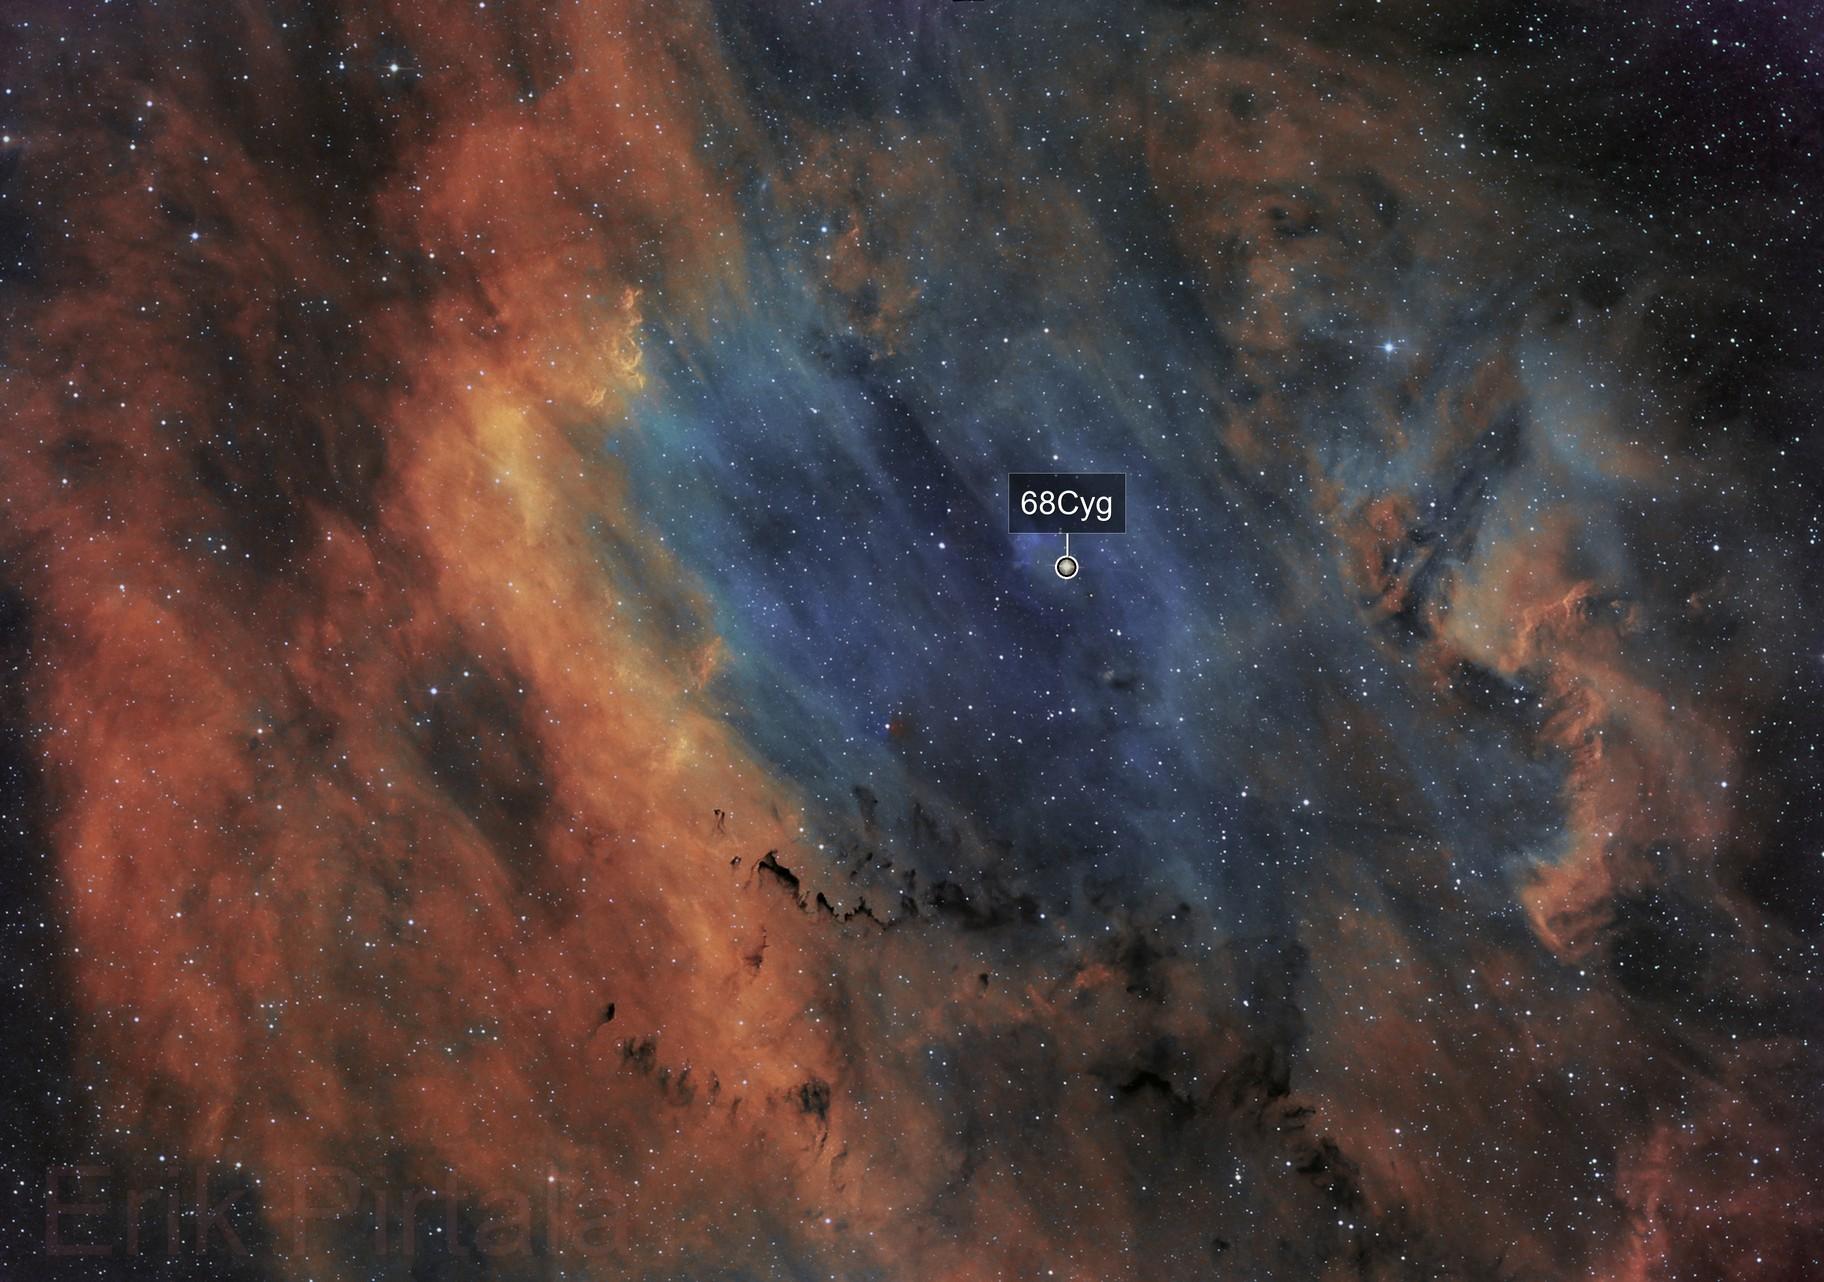 Sh2-119 in Cygnus